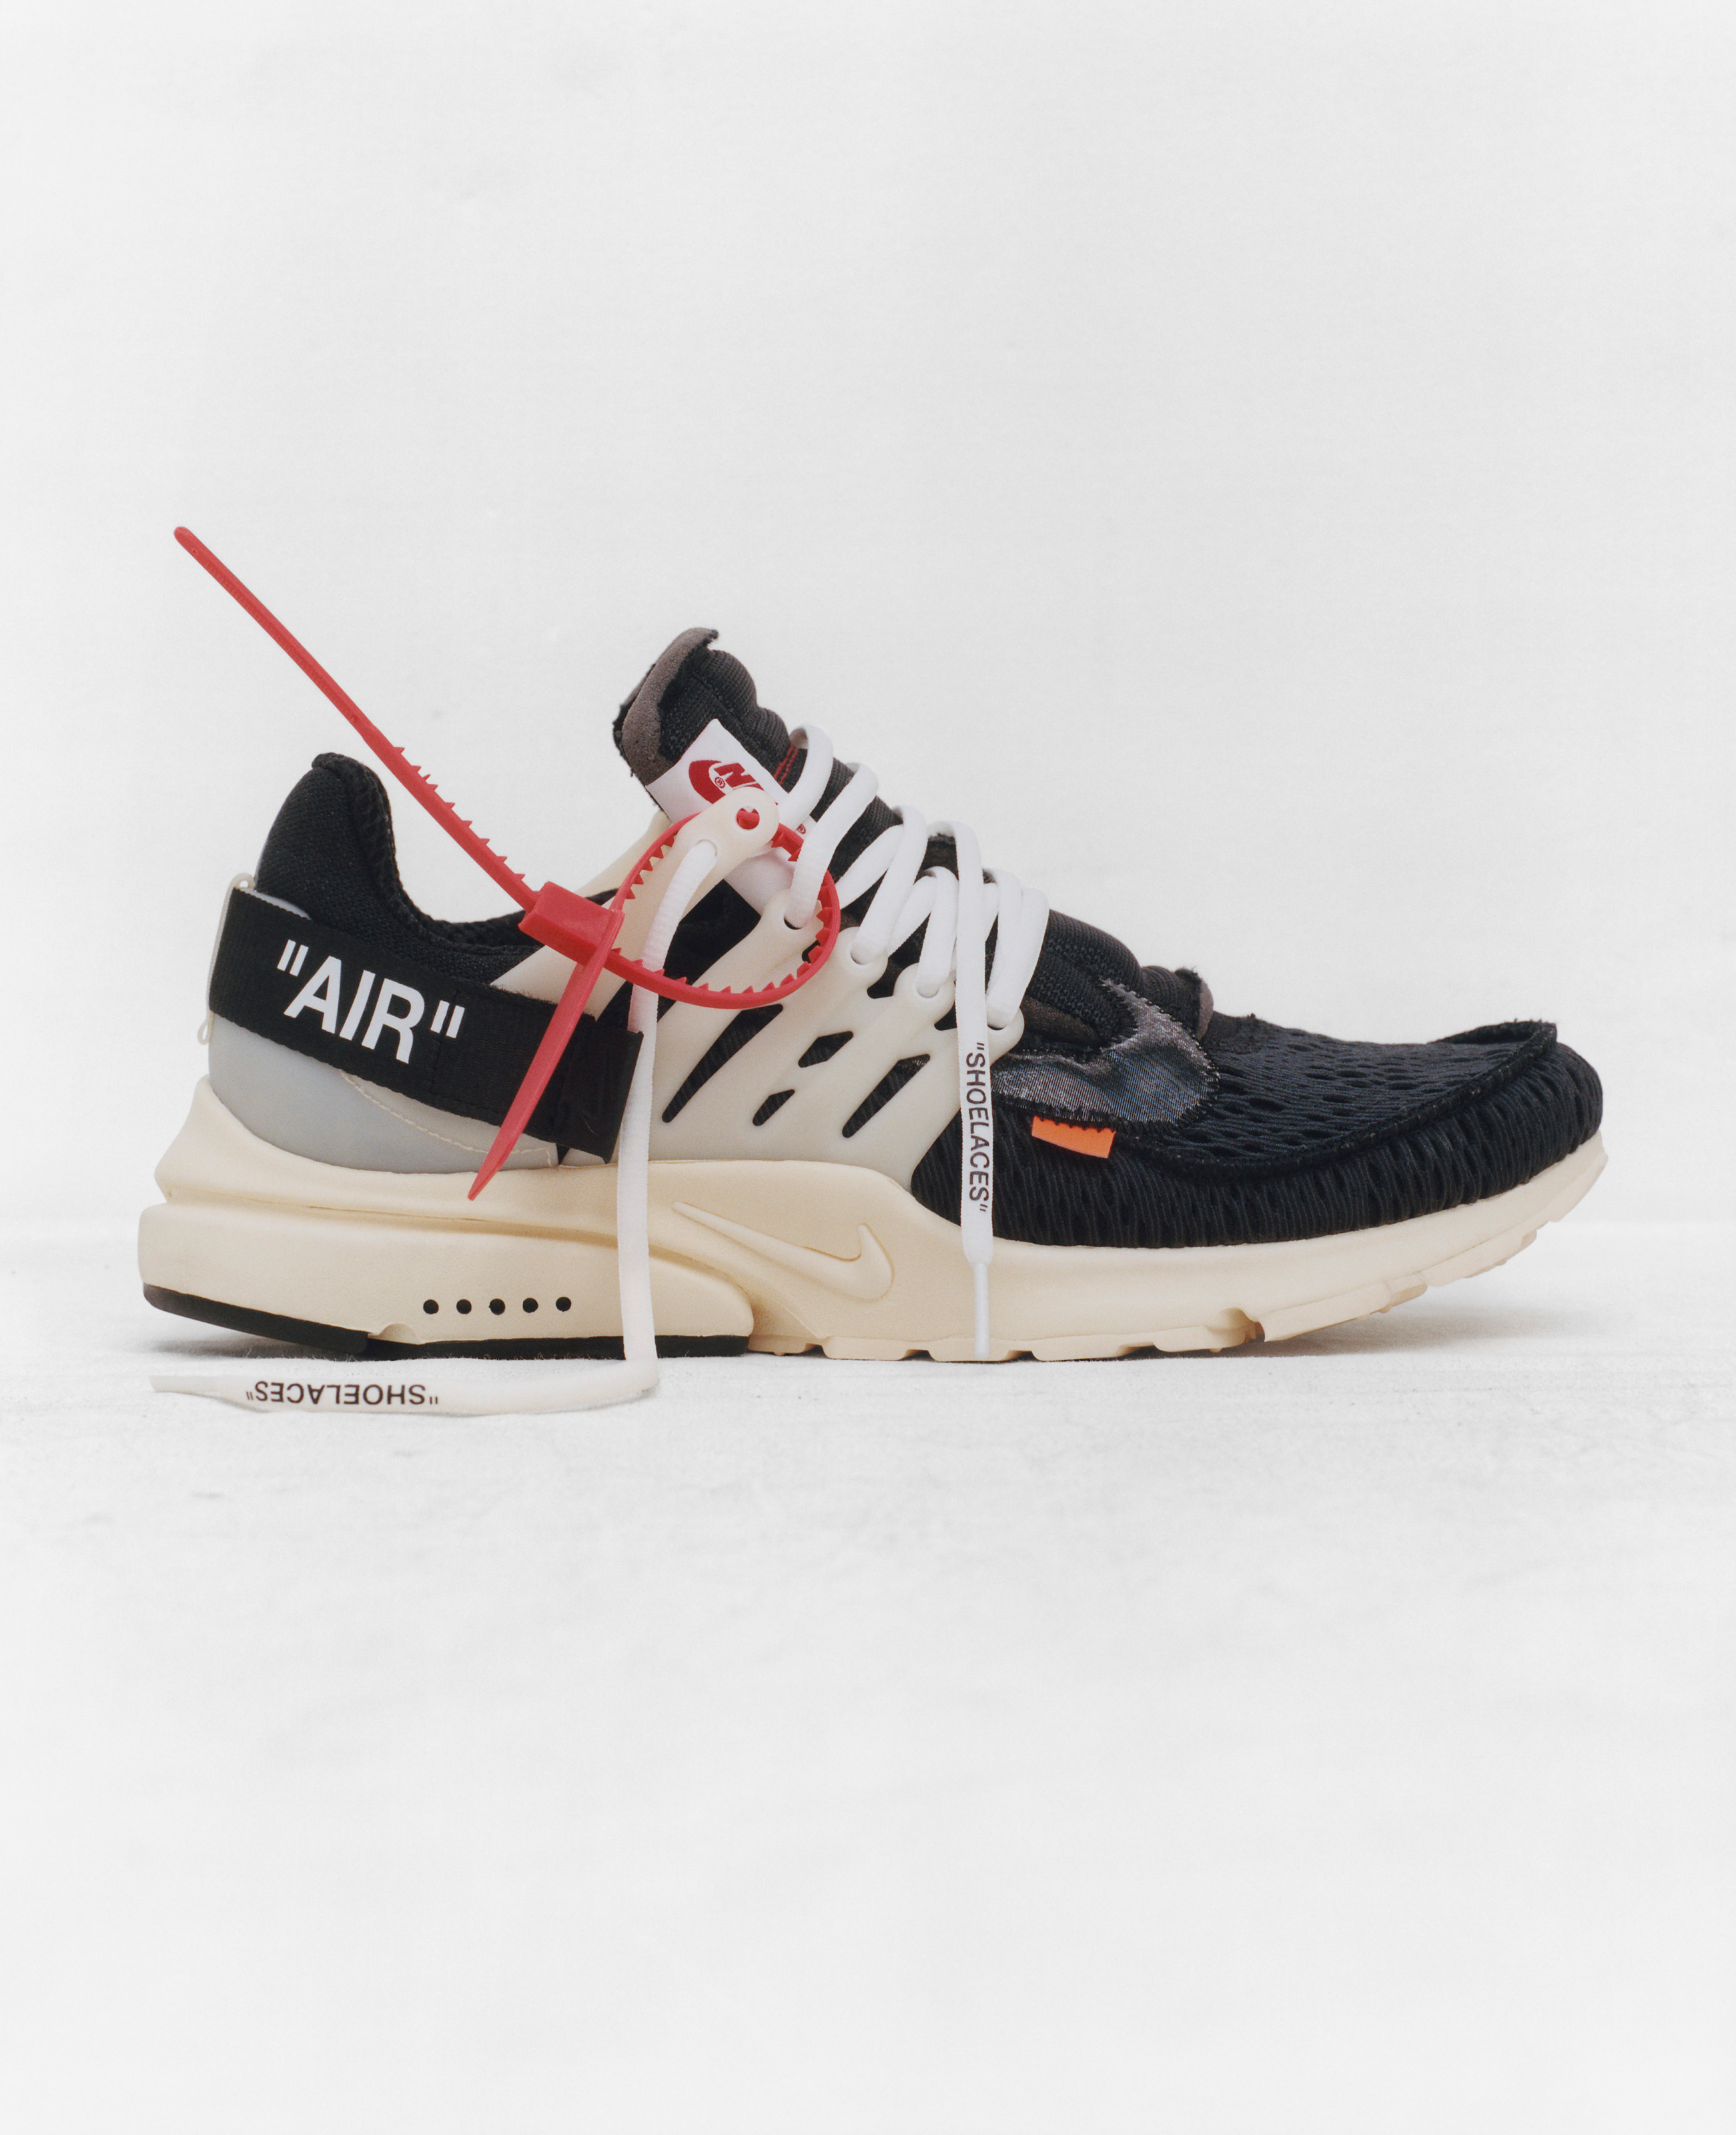 Virgil-Abloh-Nike-The10-4_73193.jpg